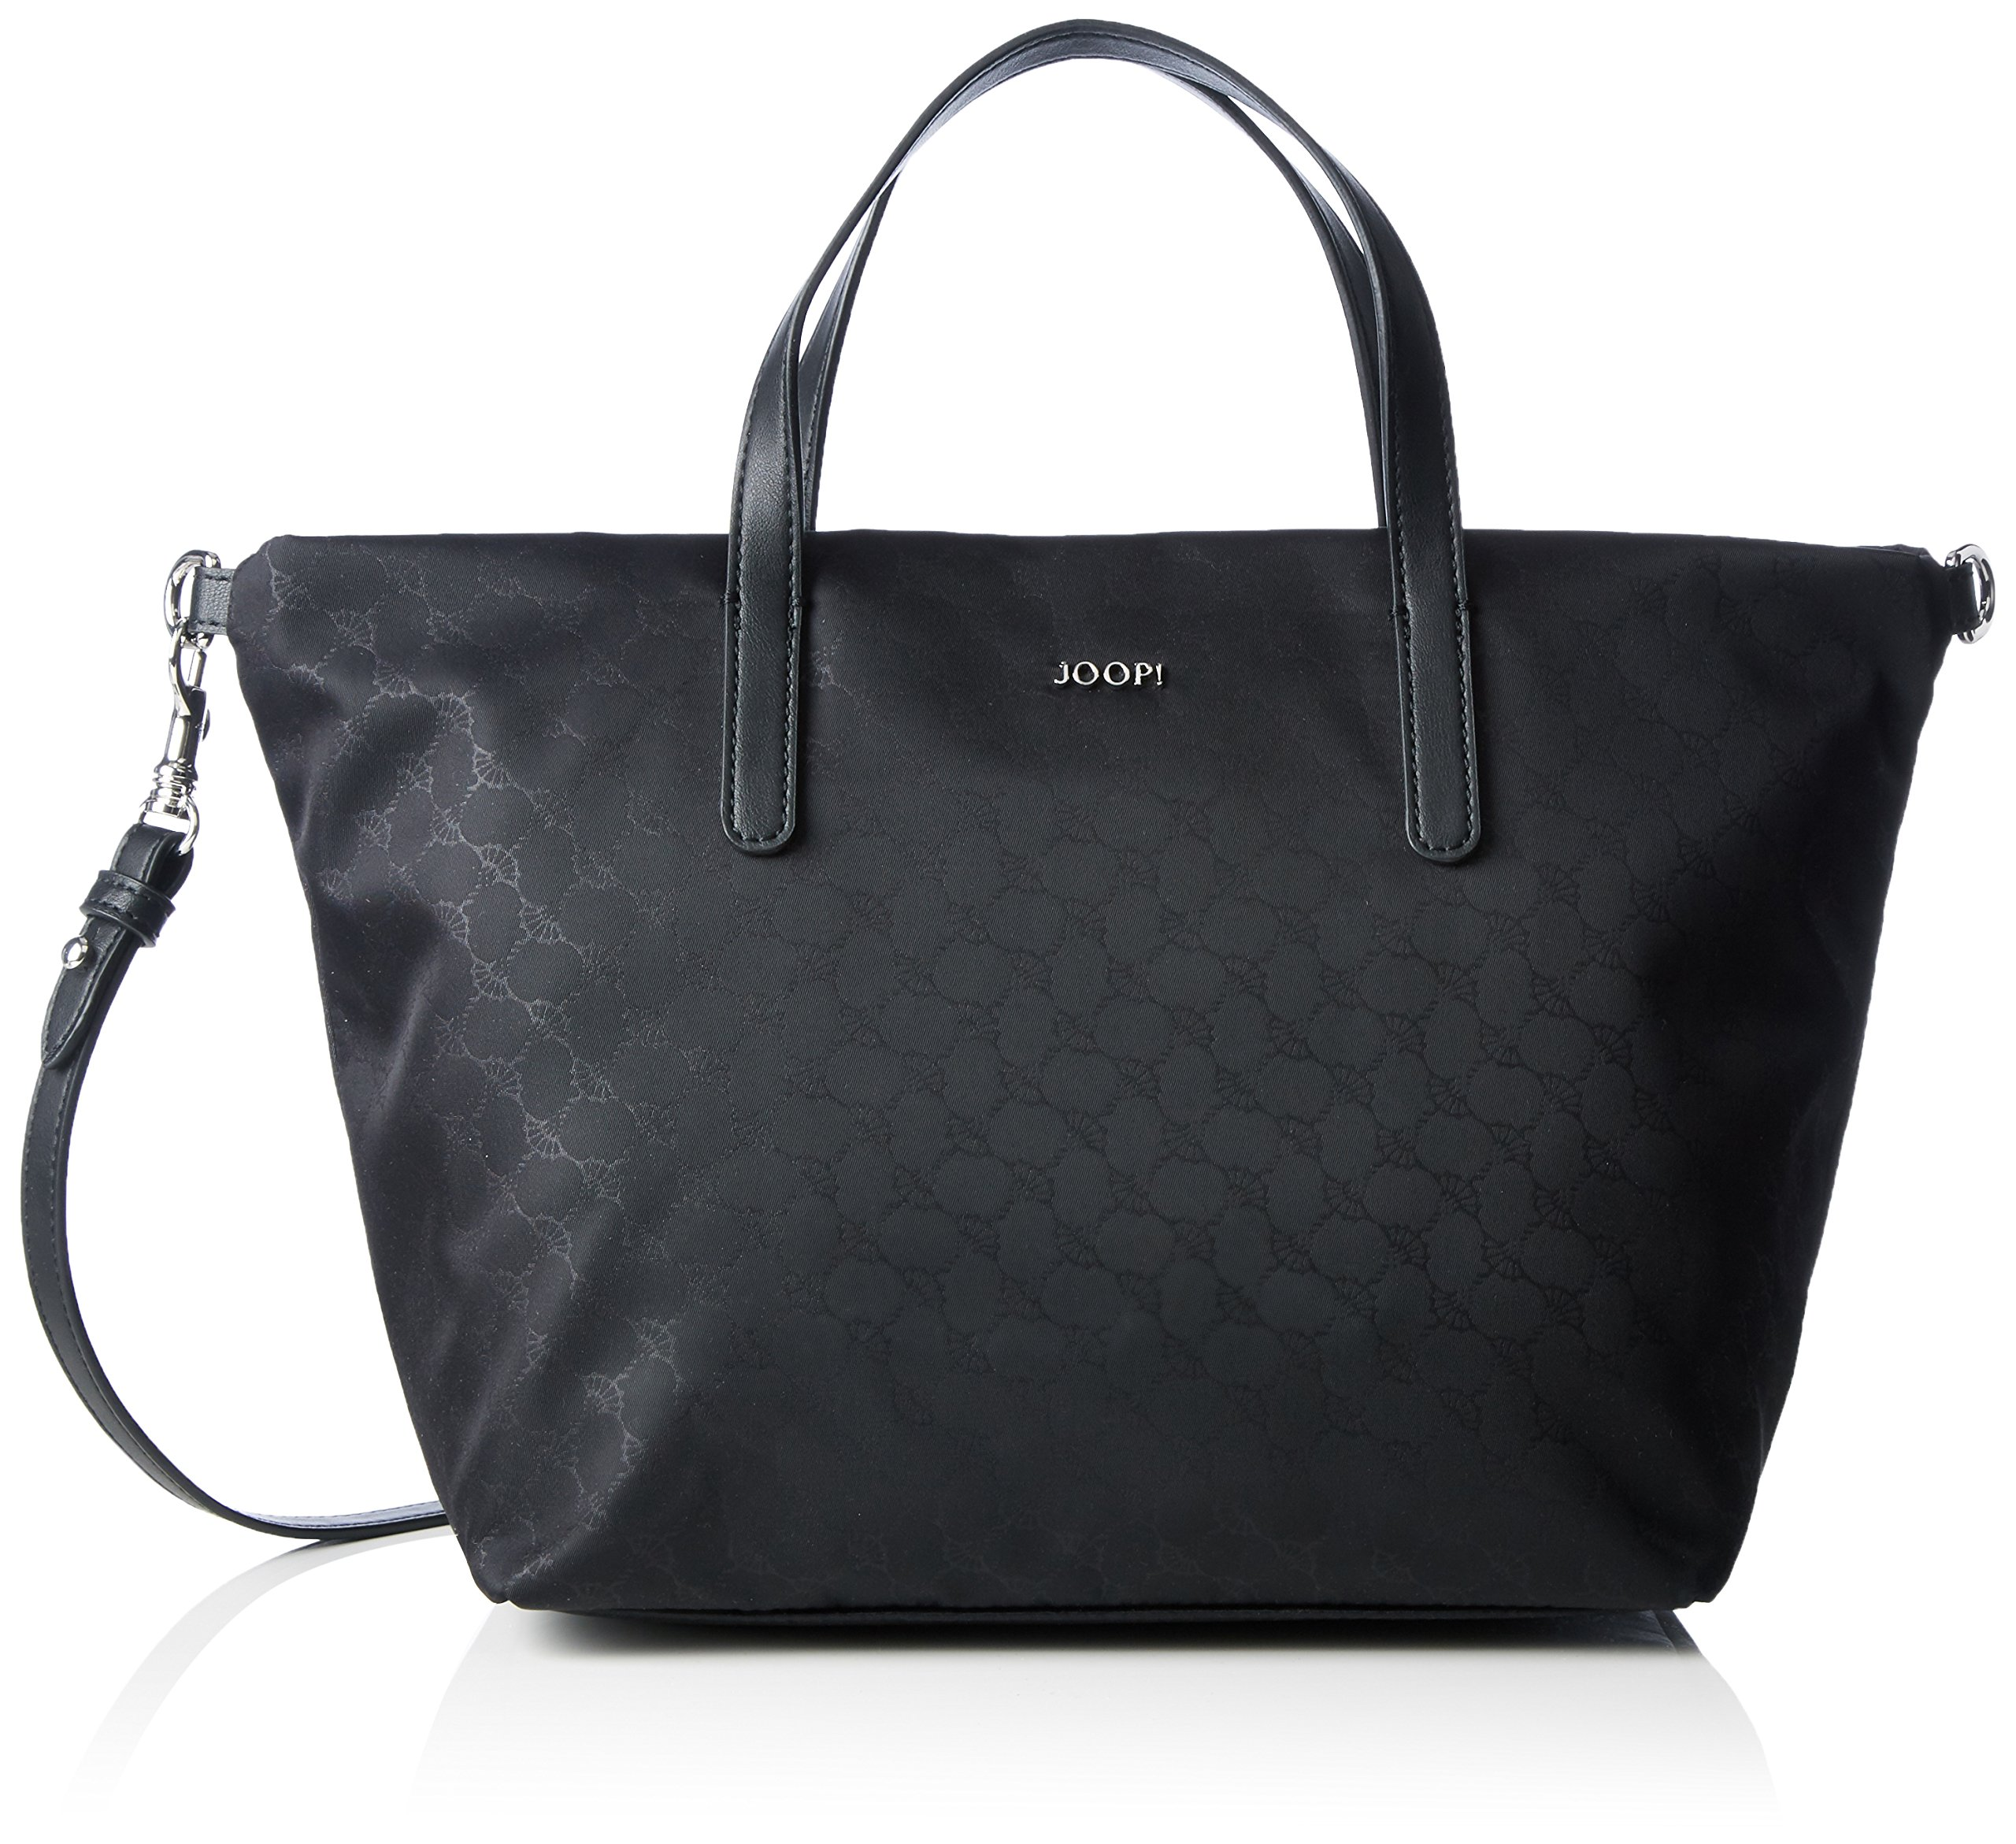 MhzSac JoopNylon FemmeNoirblack14x25x39 H L Cmw Cornflower Handbag Helena X DHE92I